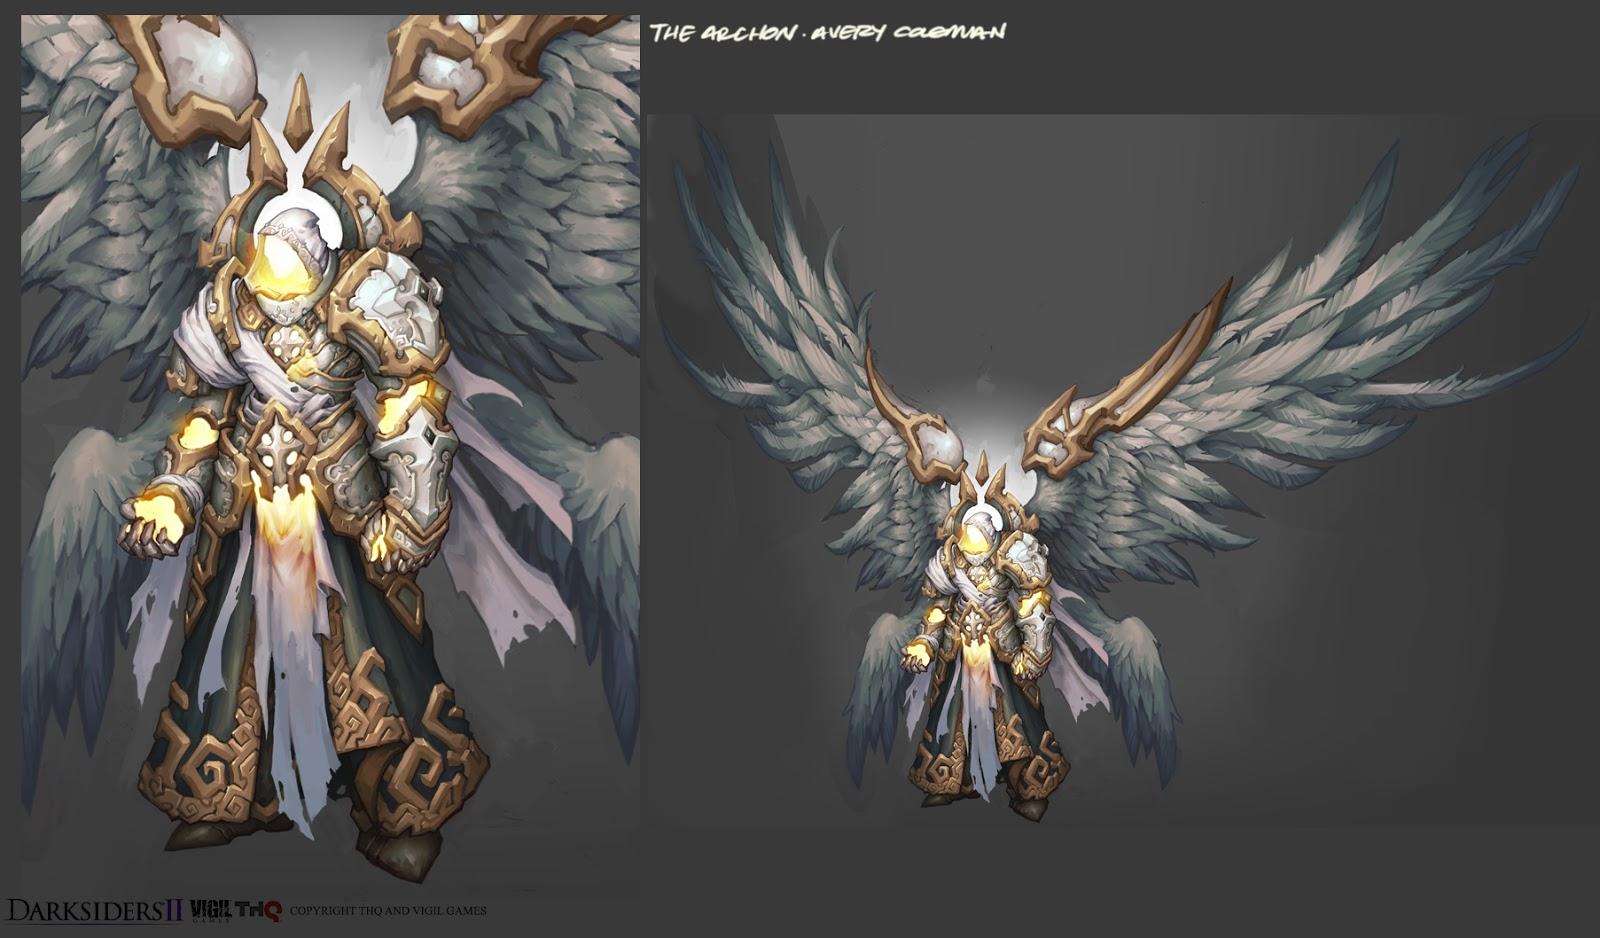 Darksiders Archon Image - Darksiders II ...